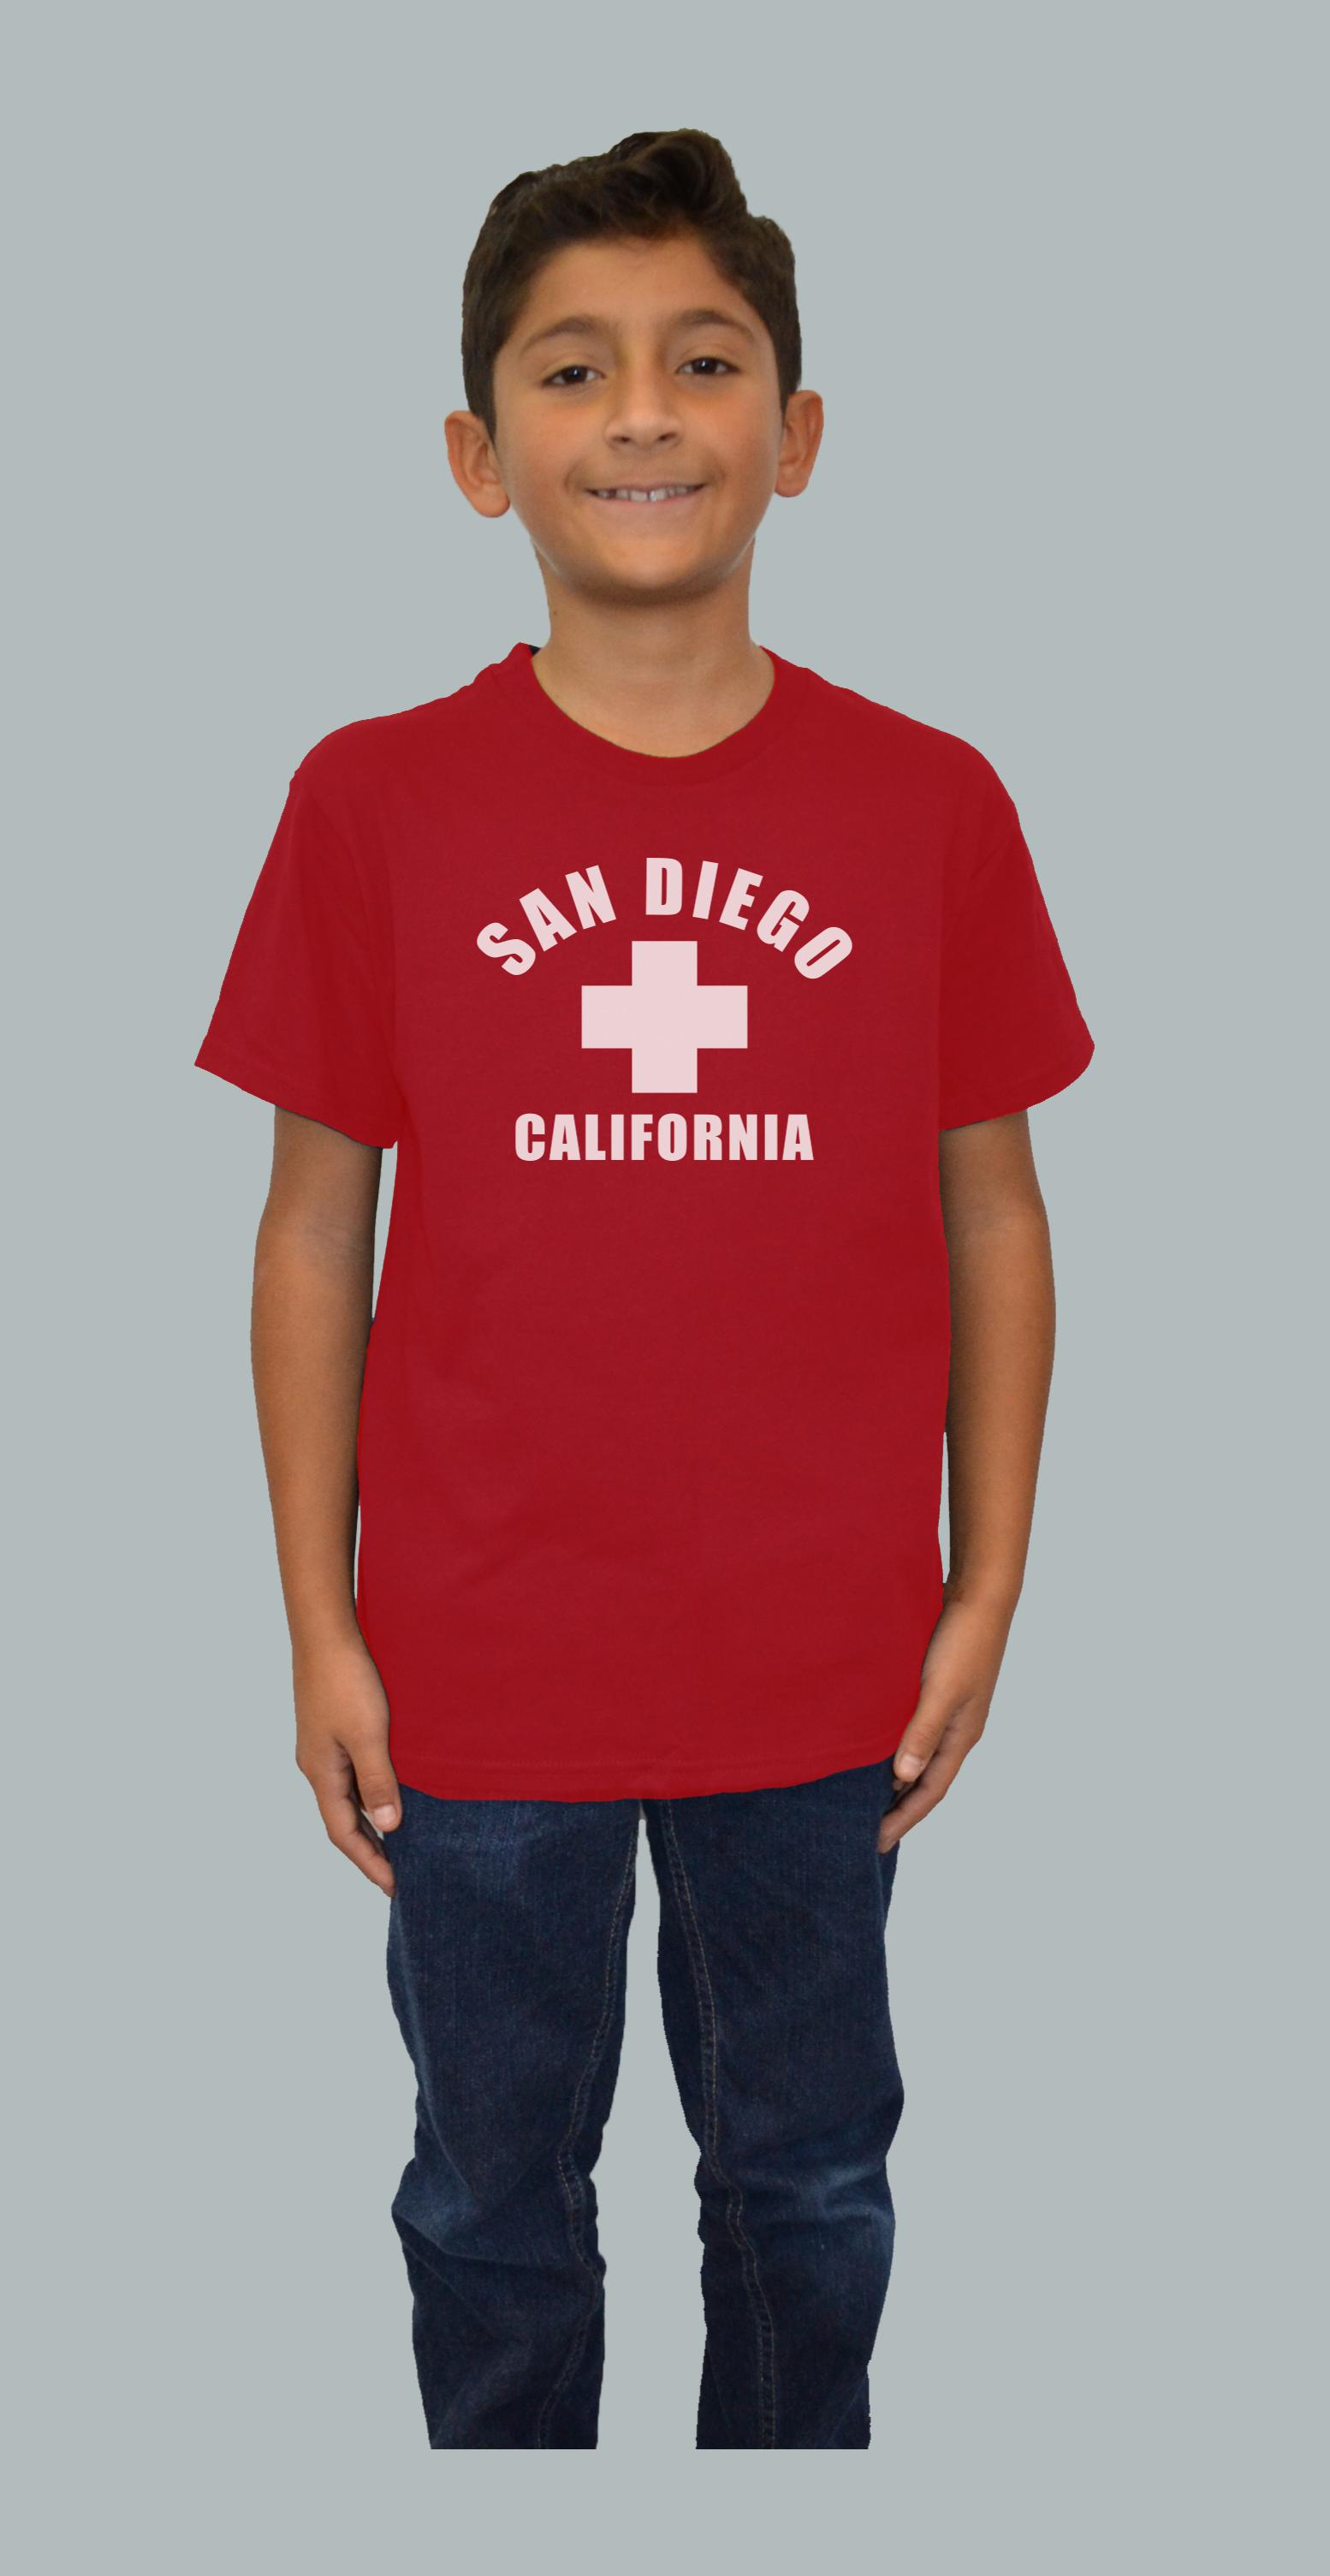 Sd cross t shirt san diego trading company for T shirt screen printing san diego